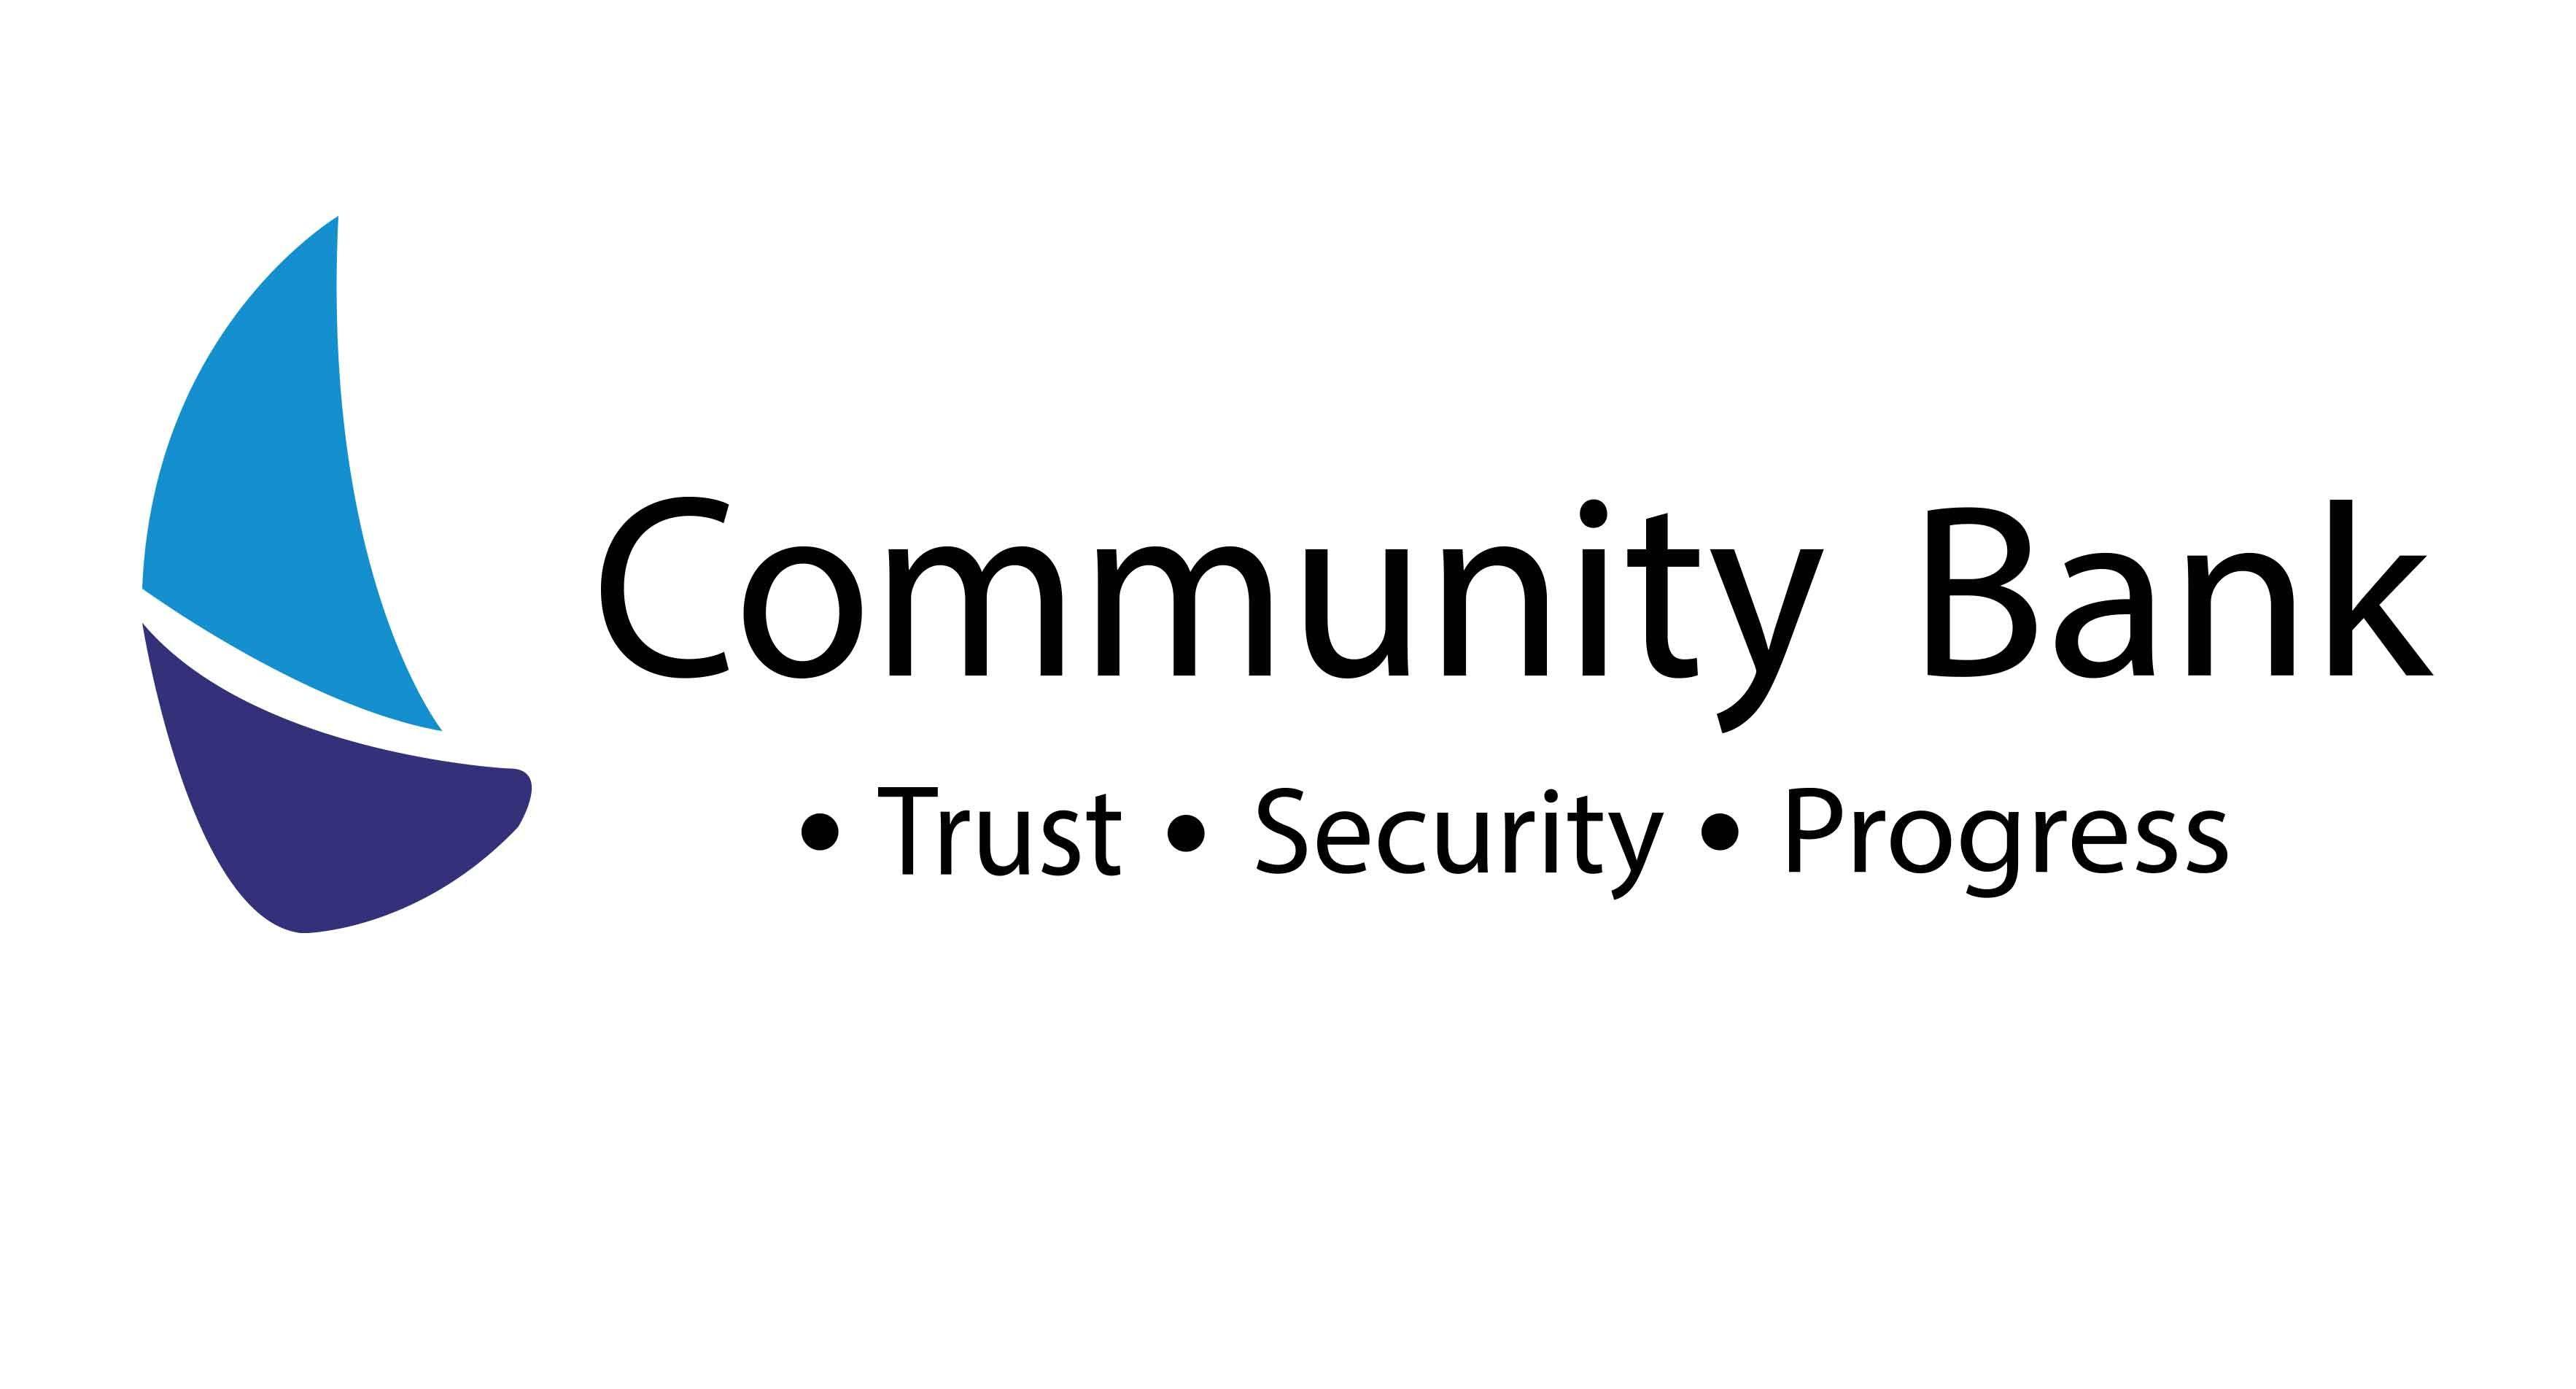 Community Bank Bangladesh Ltd Logo PSD, PNG, JPG Vector